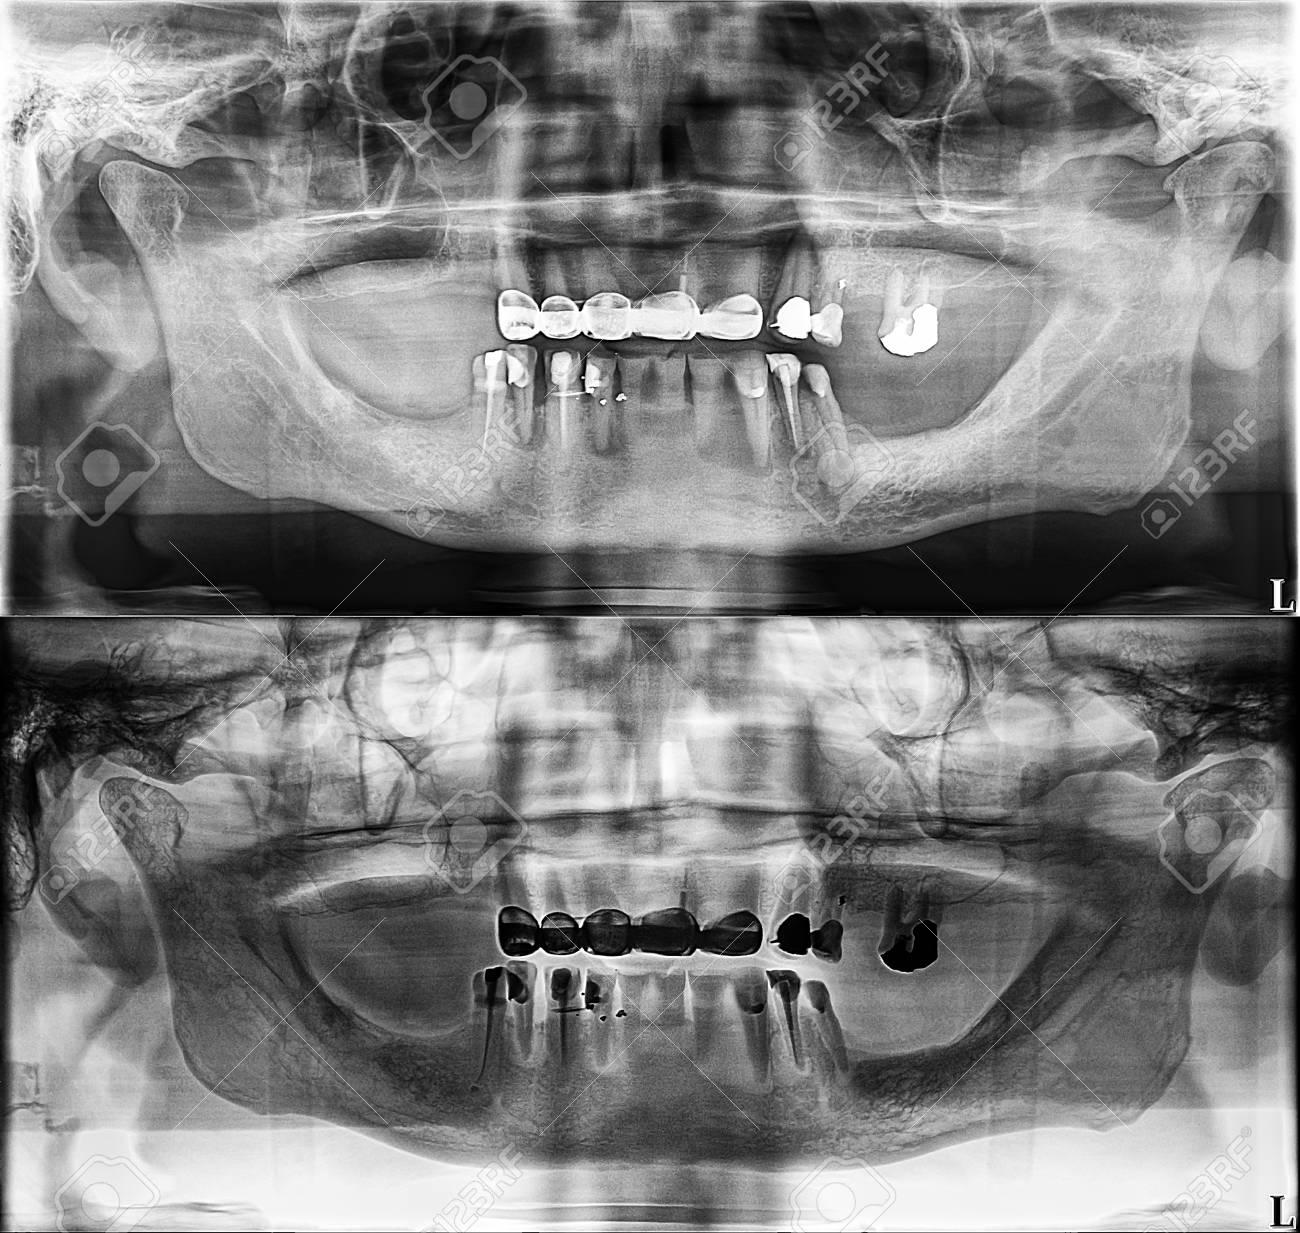 Panoramic Dental Xray, Fixed Teeth, Dental Amalgam Seal, Dental ...